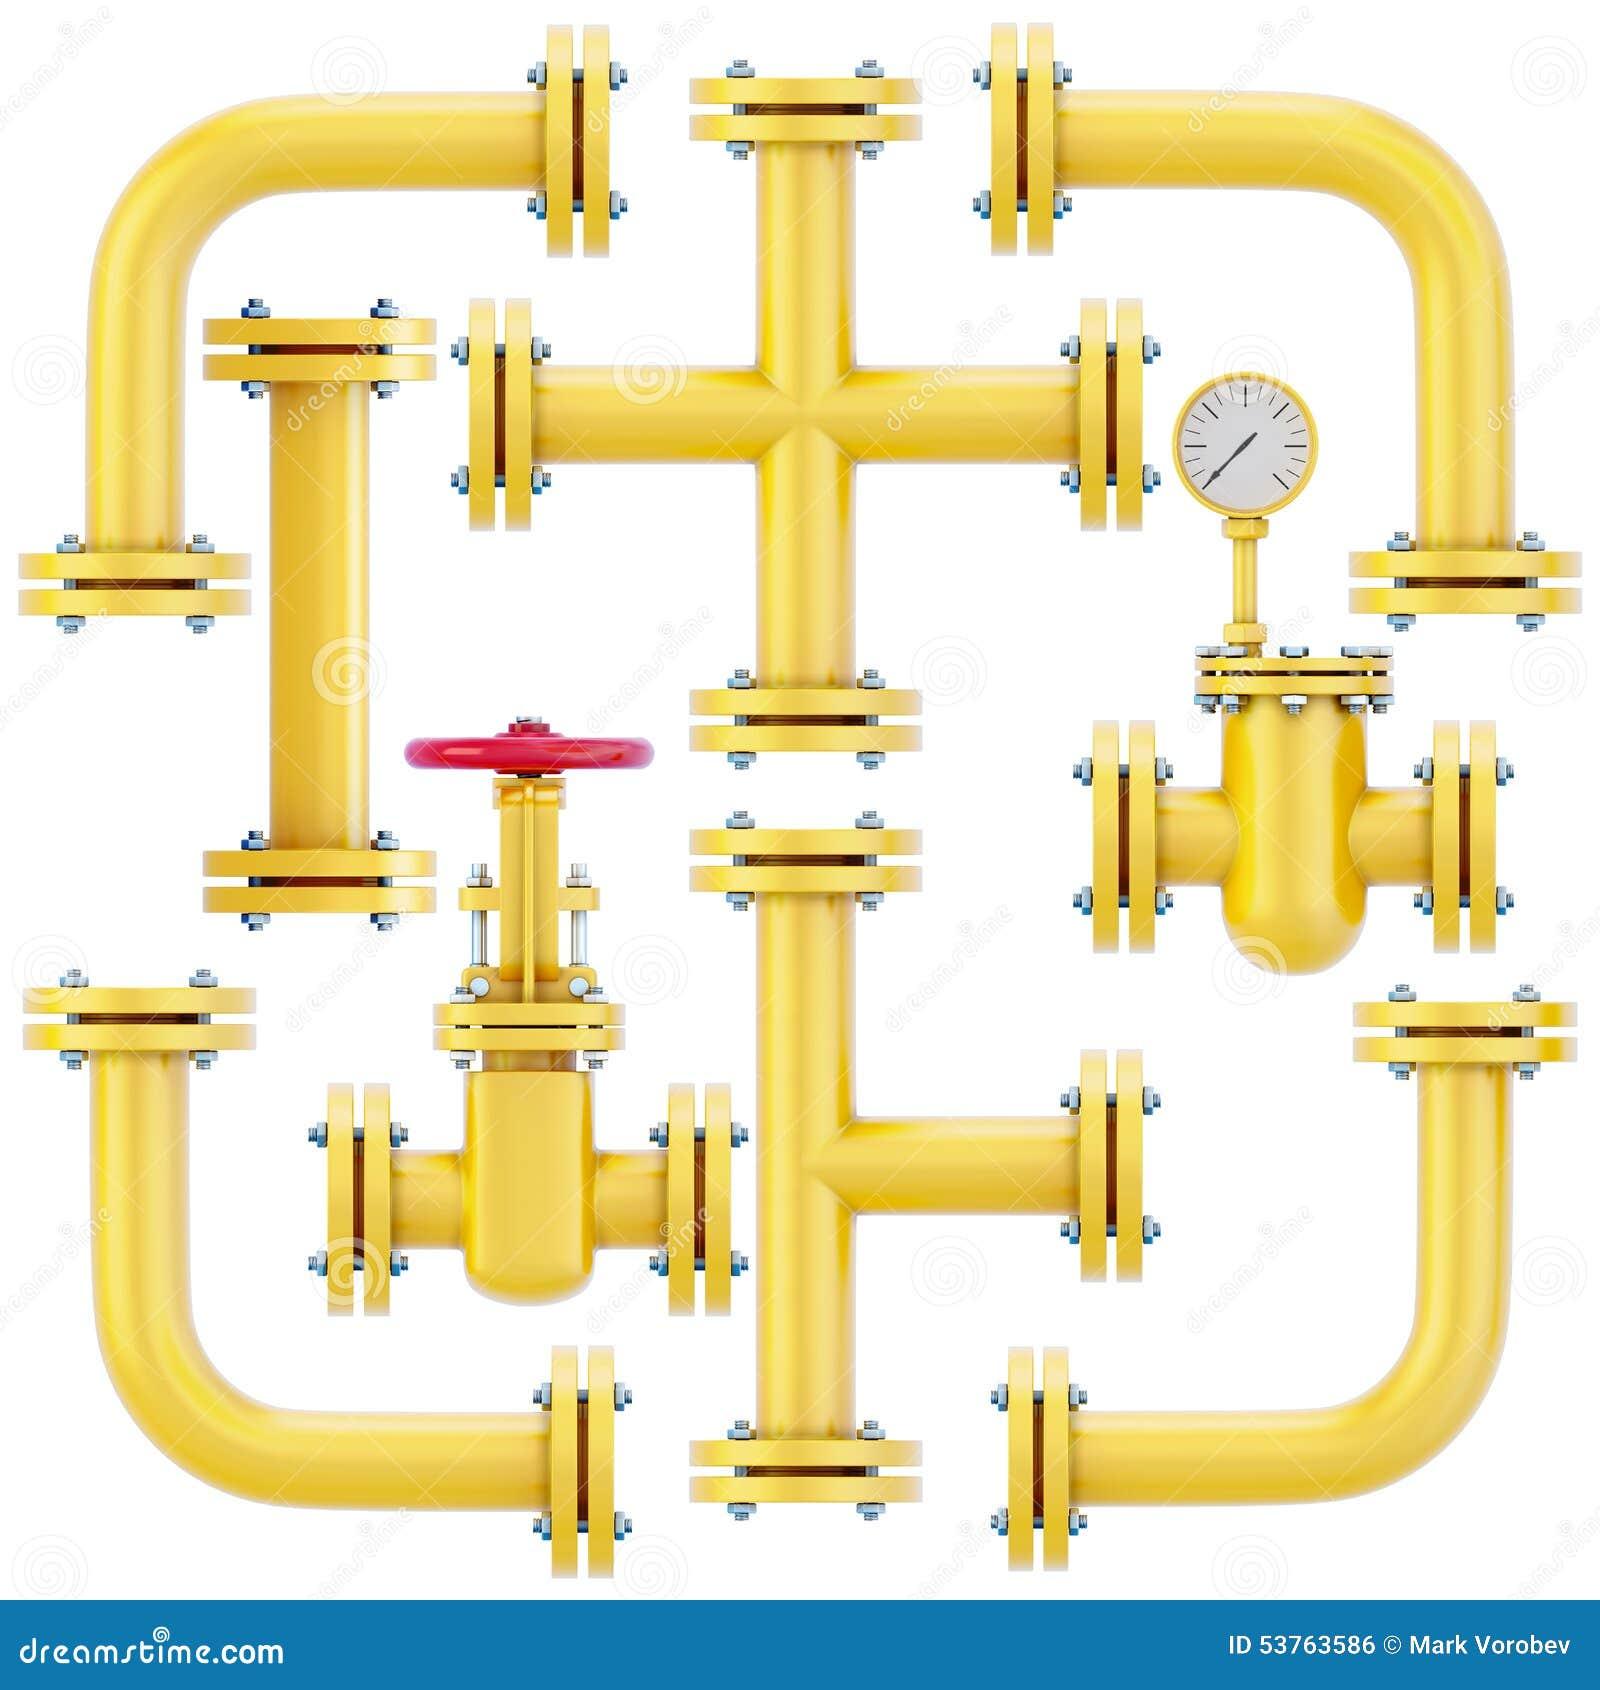 Collectionwdwn Welder Logo Graphics besides Plumbing Service Timeline Infographics in addition Stock Illustration Set Vector Logos Vitamins Large Image54140337 additionally 116809 Plumbing Retro Logos furthermore Pdm Plumbing. on retro plumbing logos